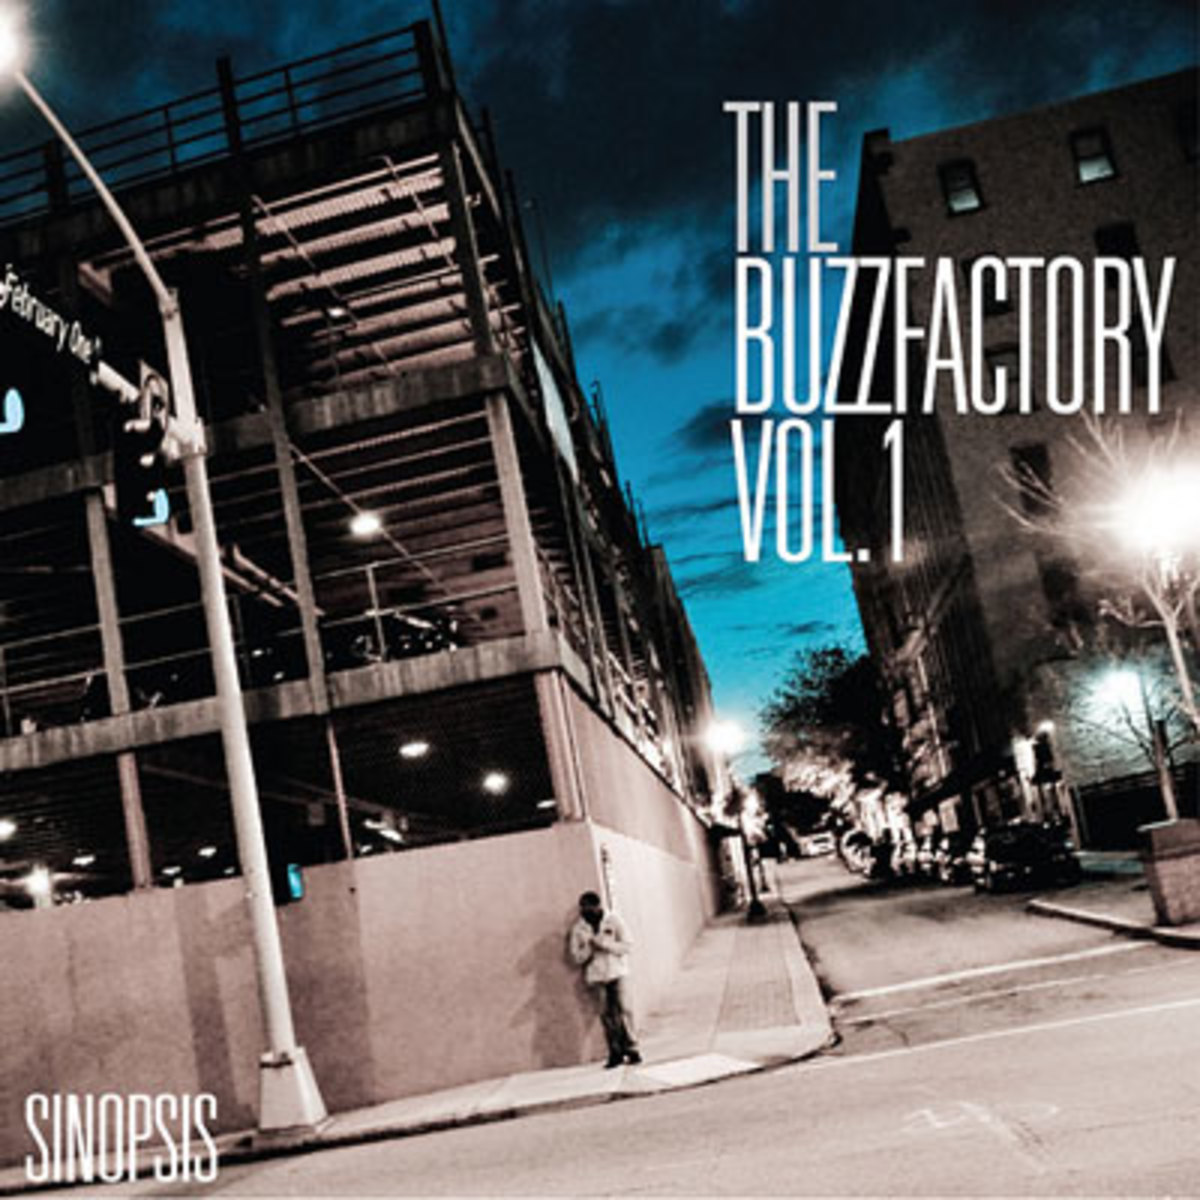 sinop-buzzfactory.jpg